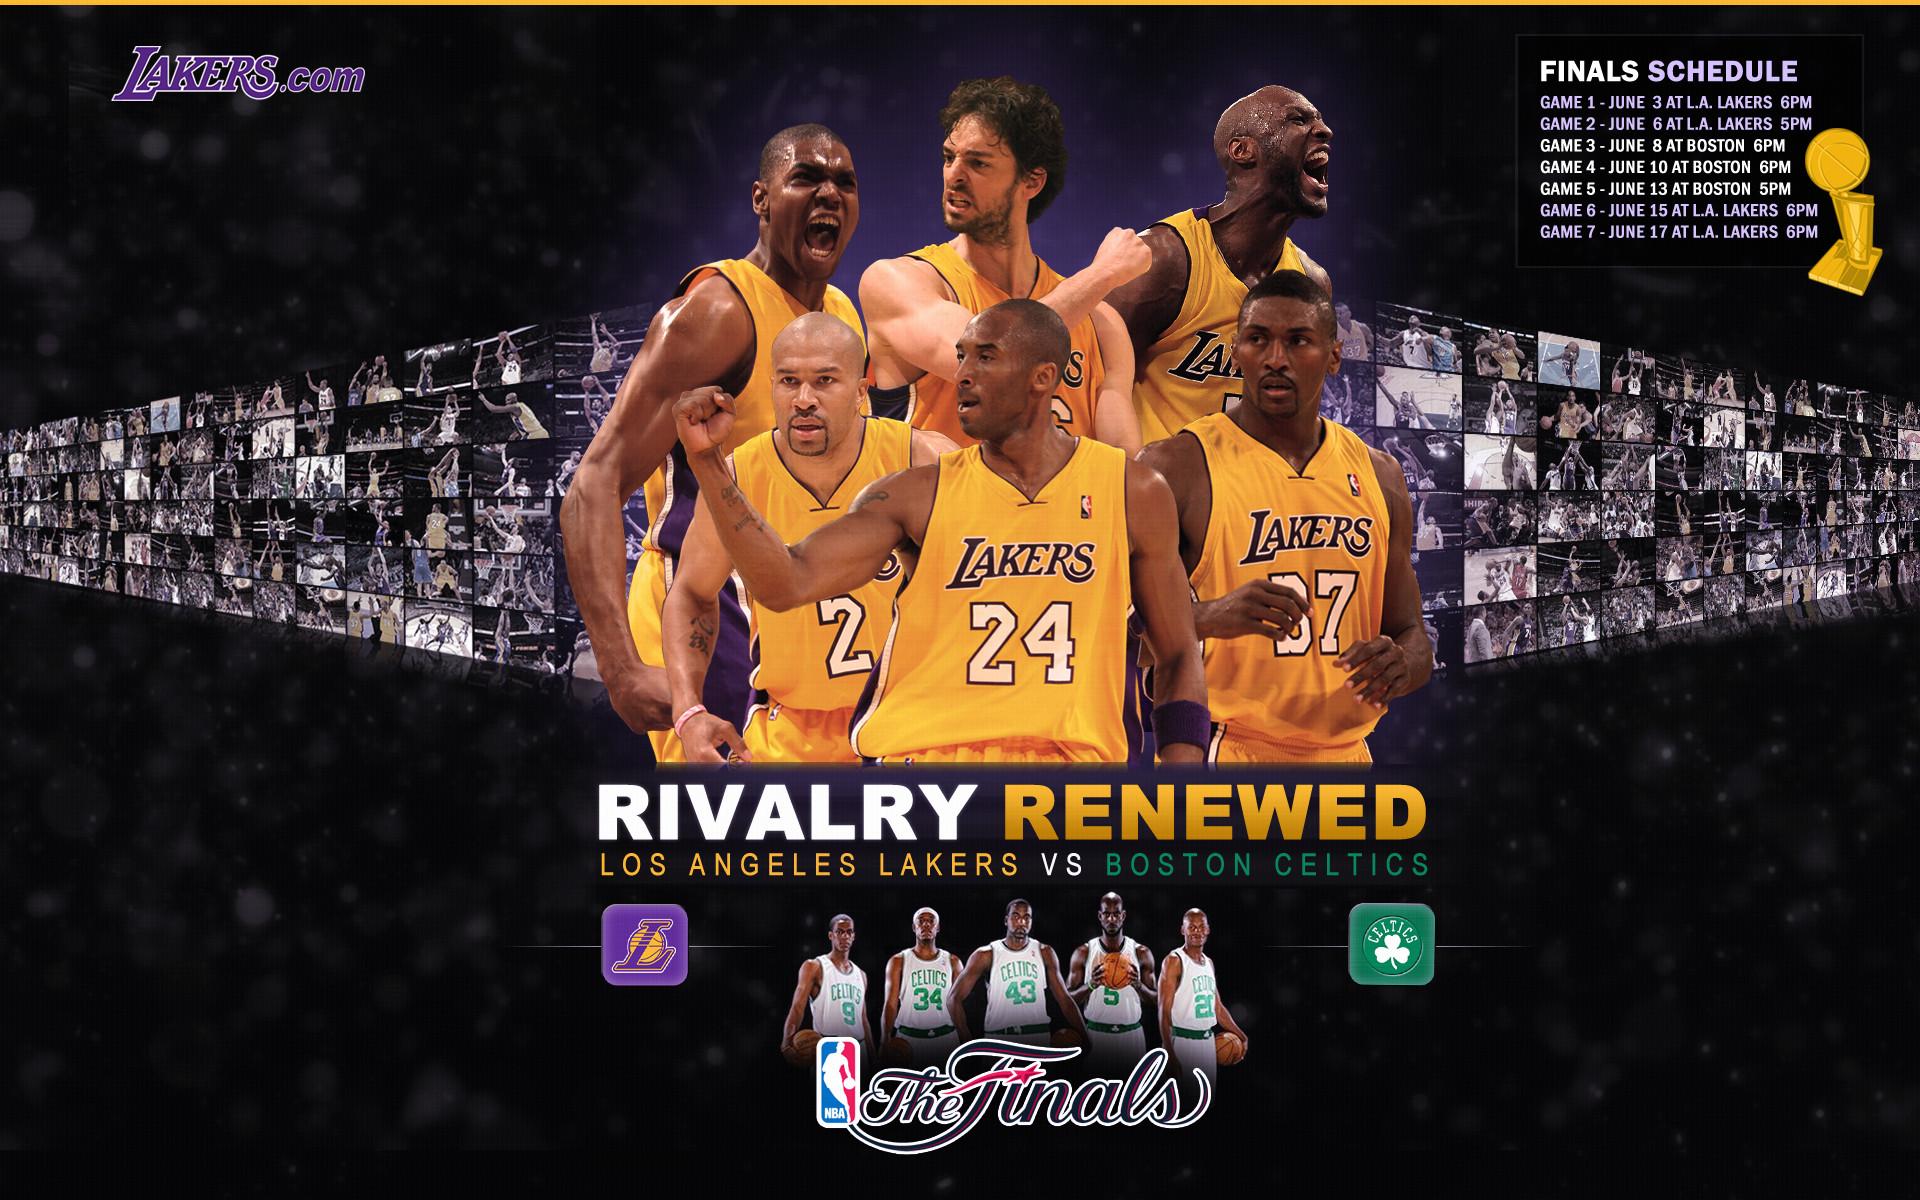 Demar Derozan Toronto Nba Lwp For Android - Lakers Schedule 2010 2011 , HD Wallpaper & Backgrounds